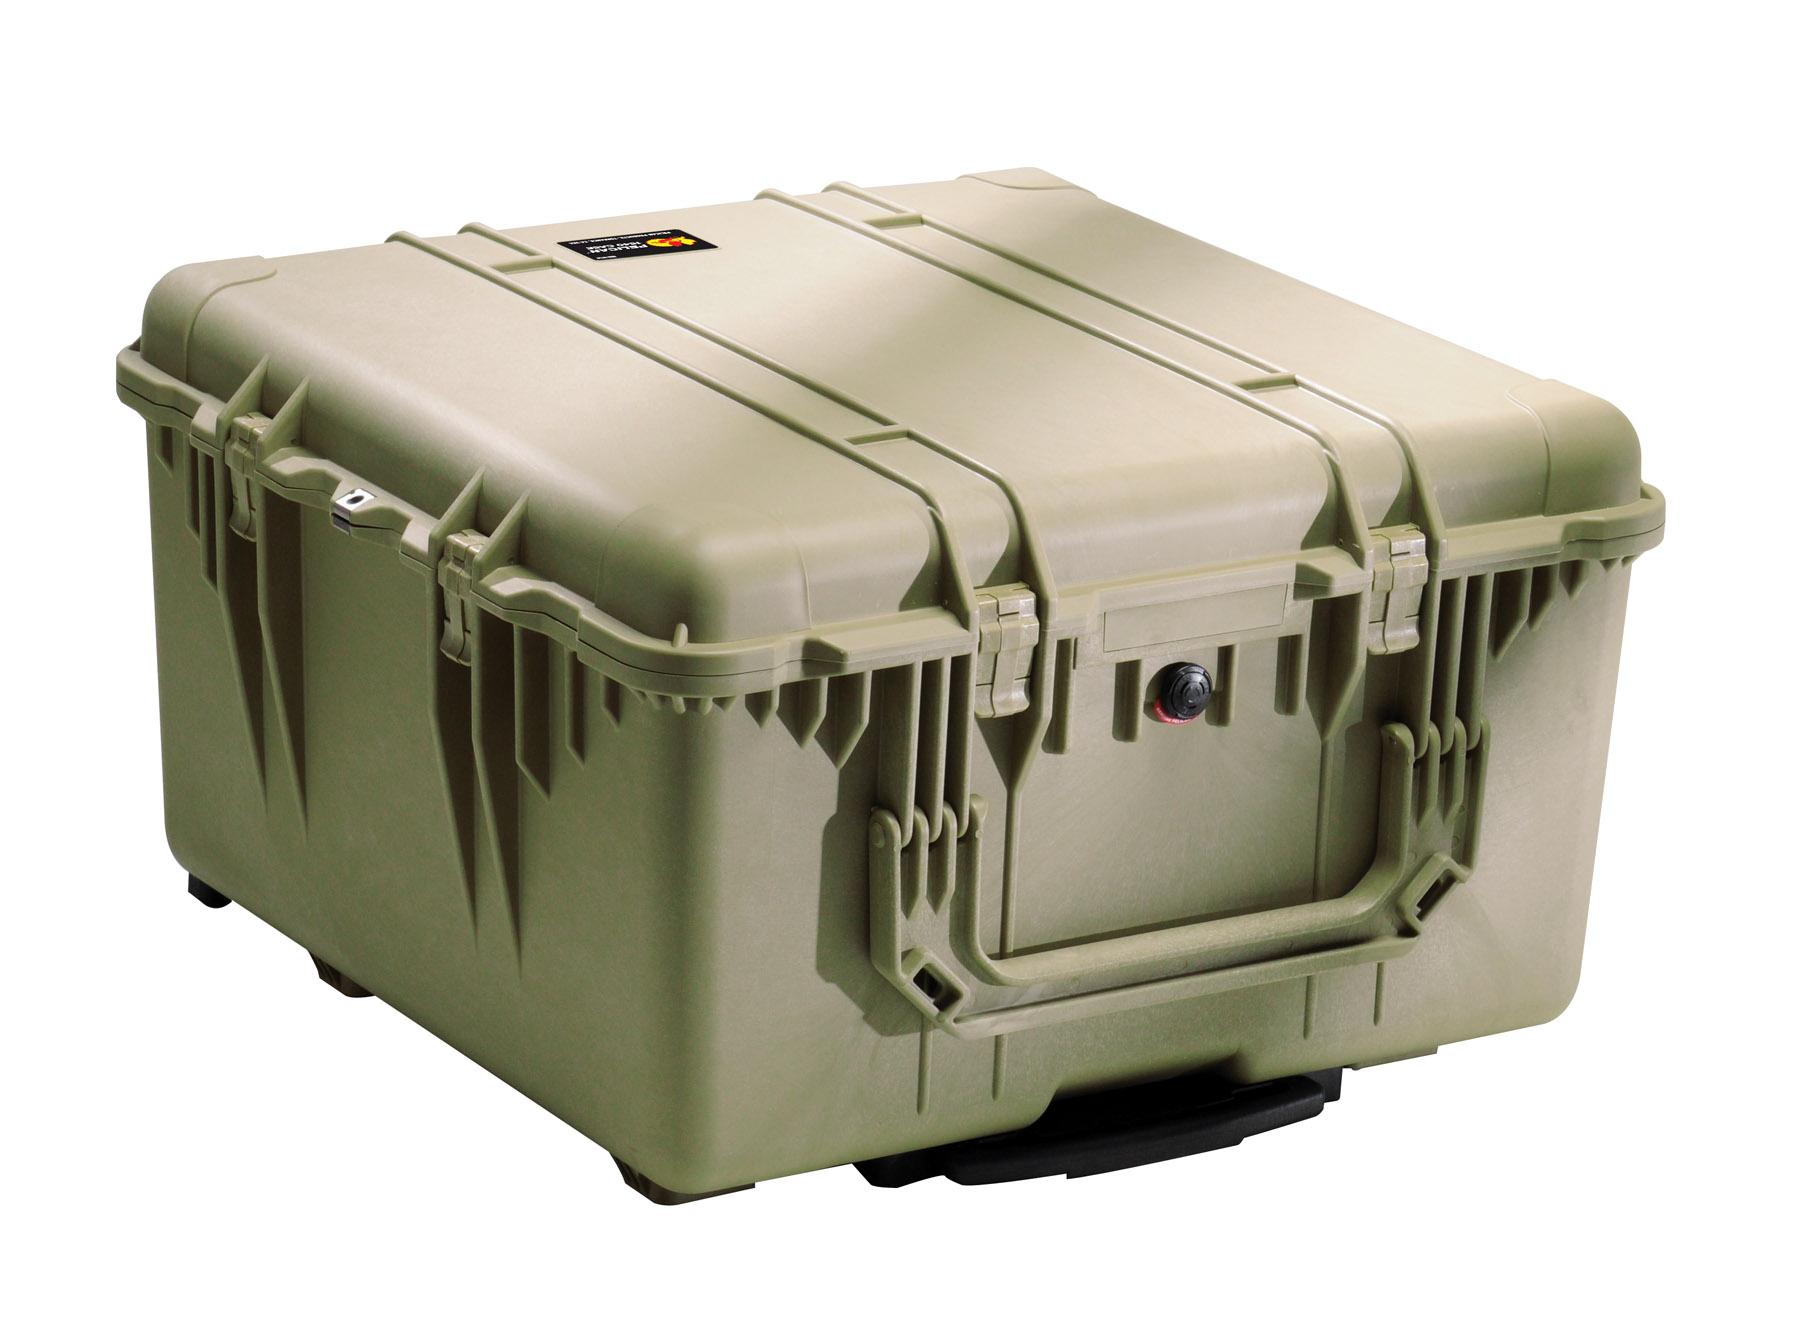 1640 - Pelican 1640 Large Pelican Hard Case Transport